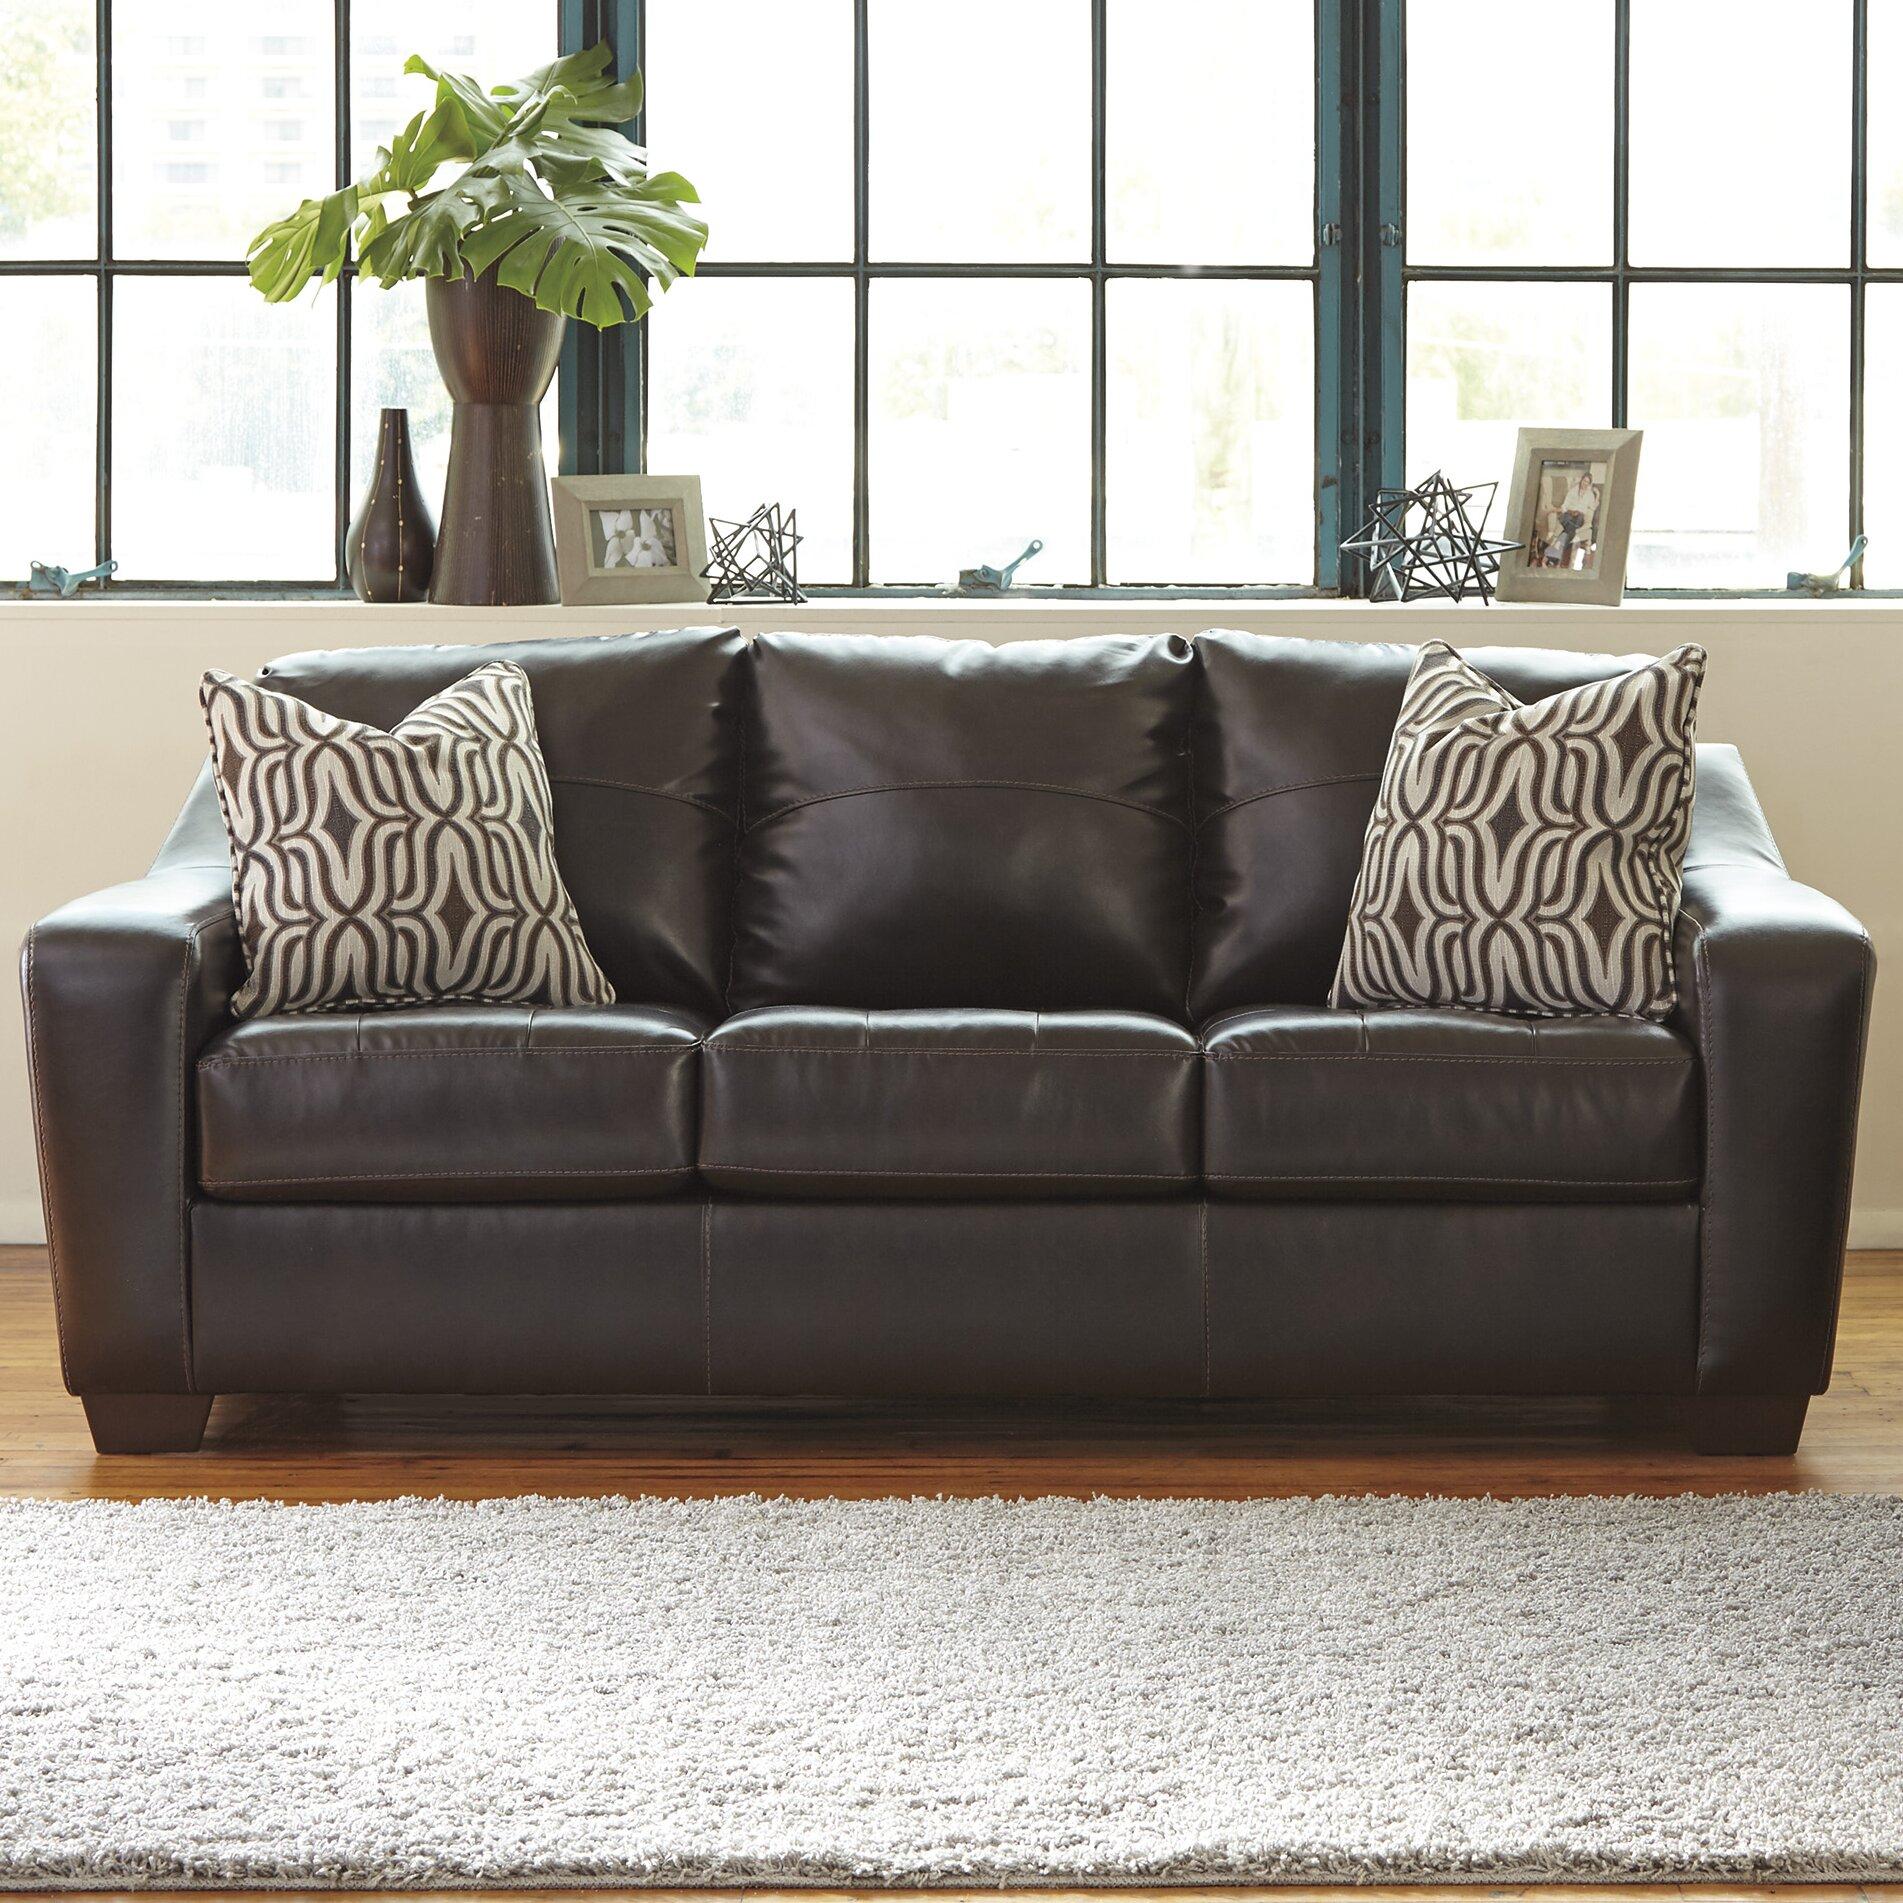 Benchcraft Coppell Sleeper Sofa Reviews Wayfair